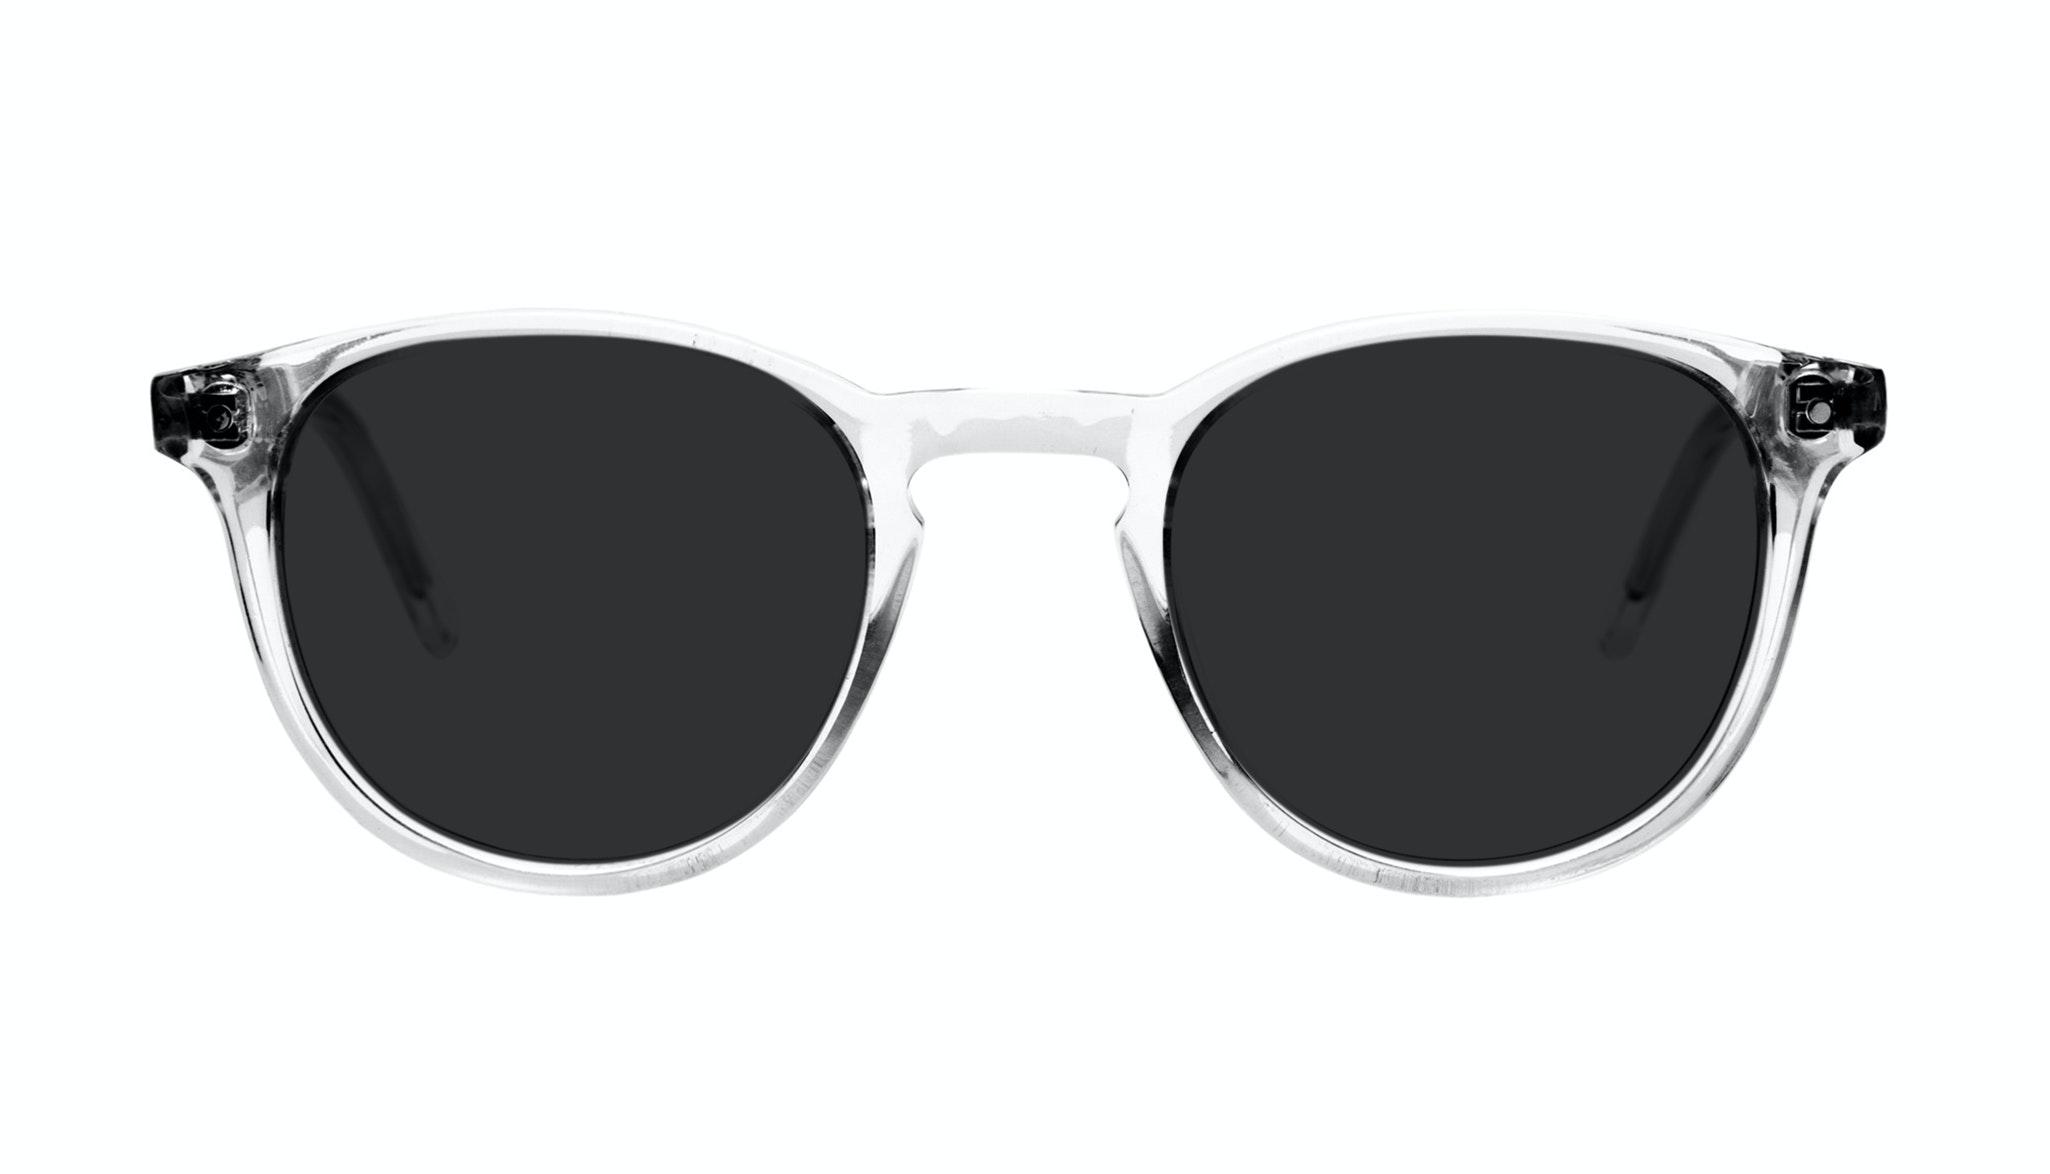 Affordable Fashion Glasses Round Sunglasses Men Cult Diamond